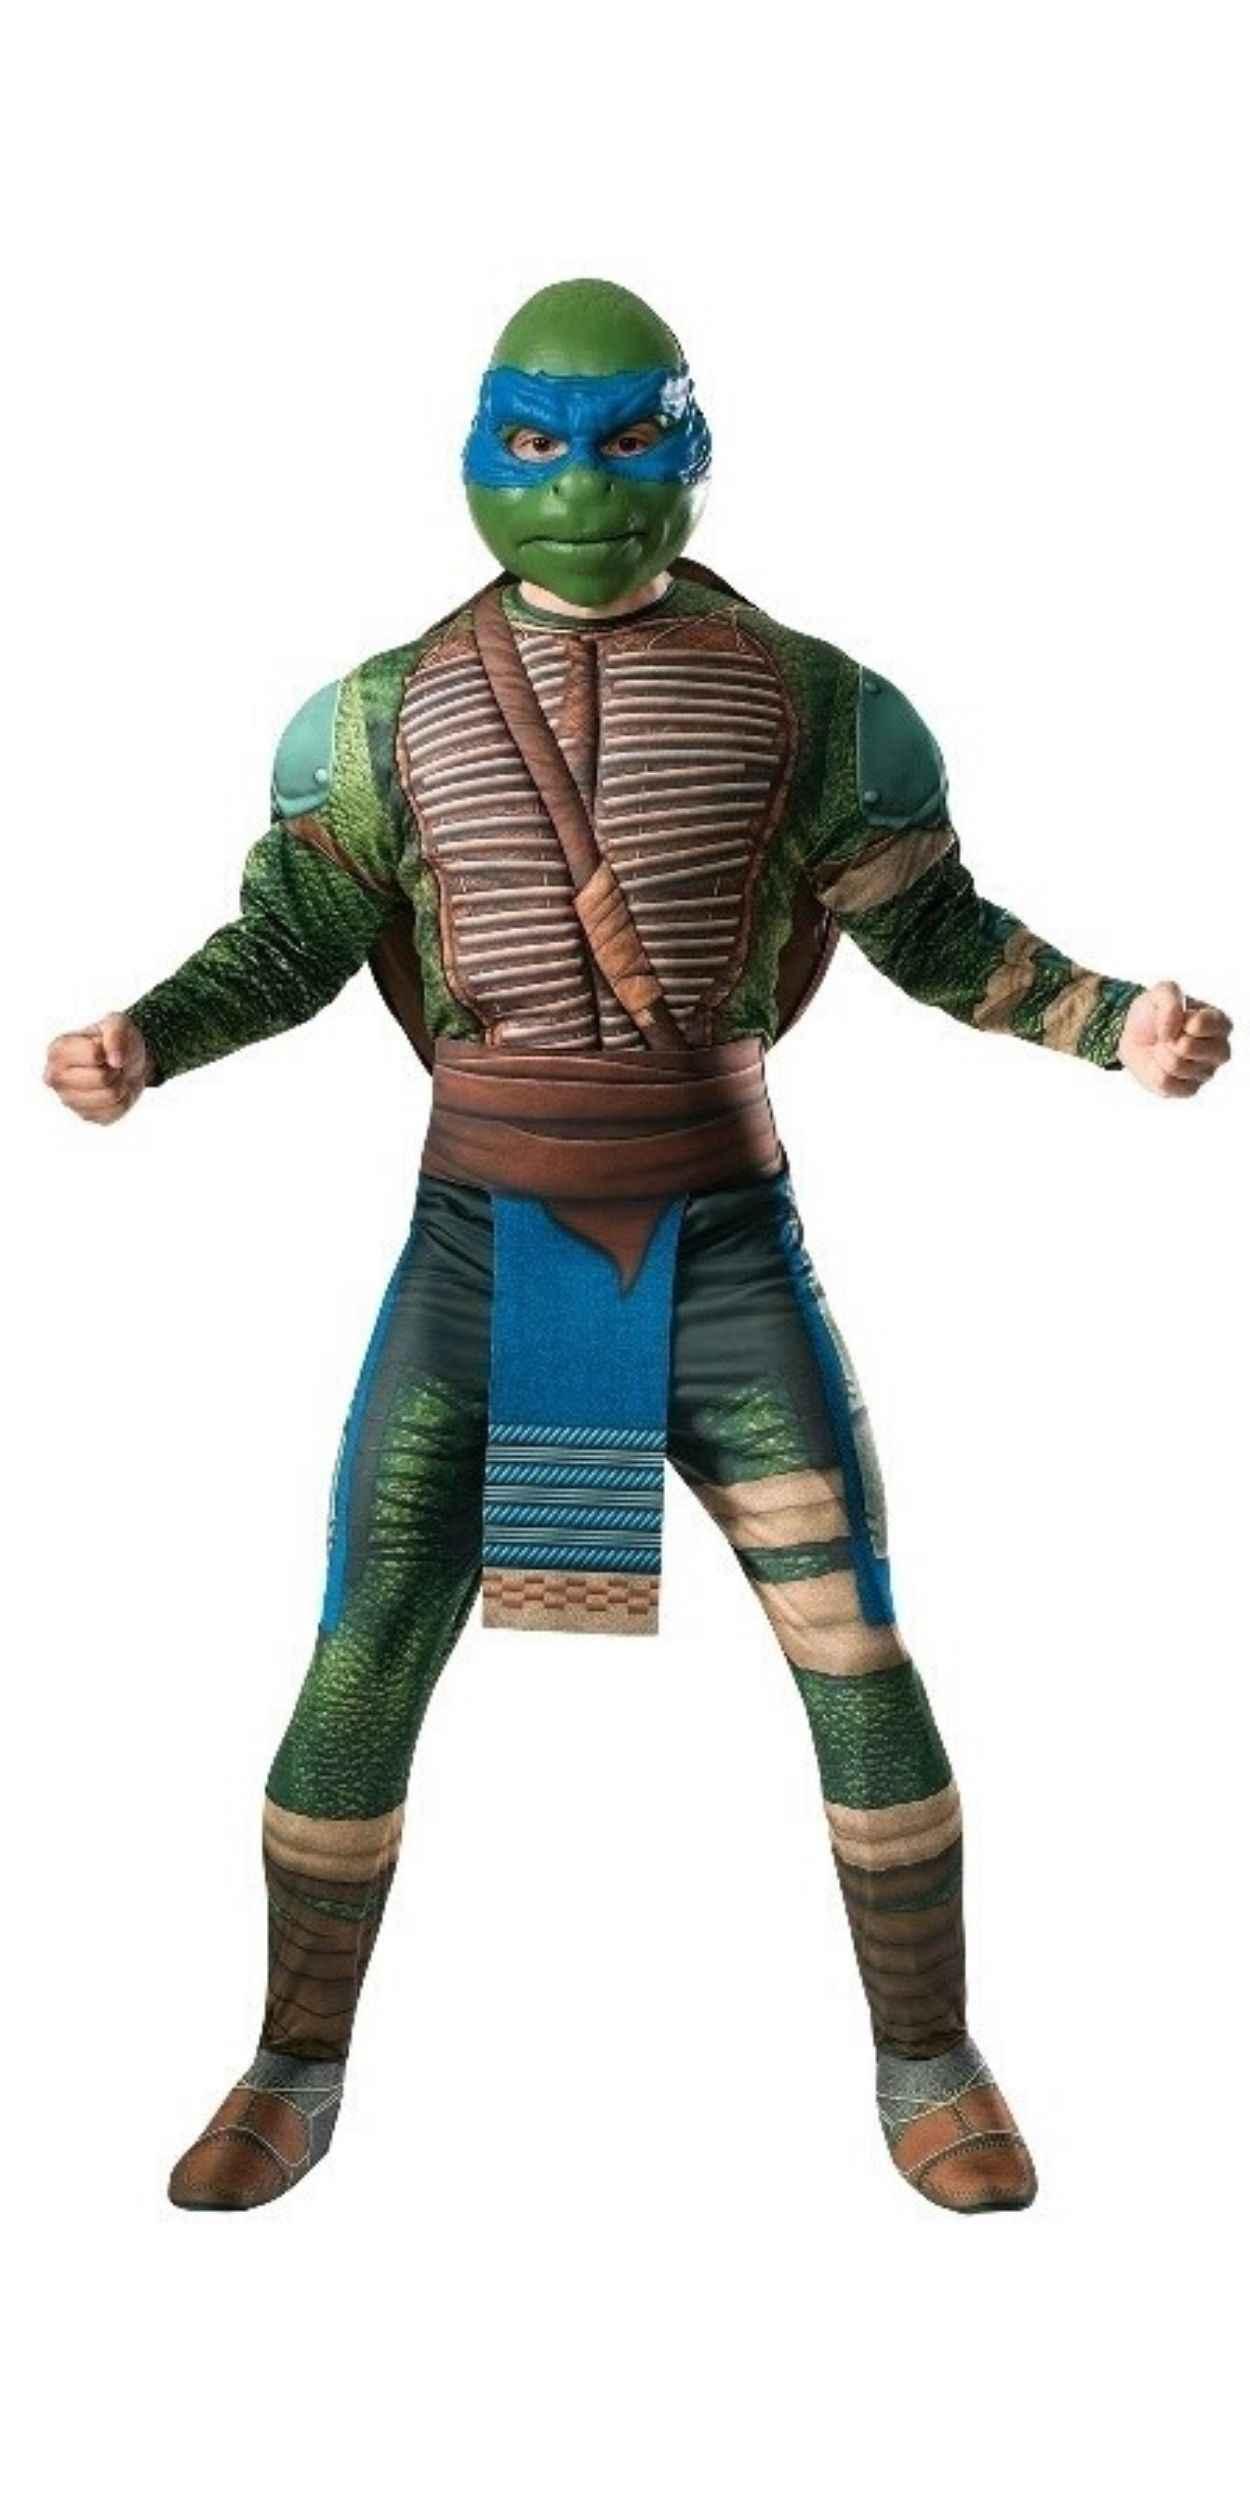 Man in Ninja Turtle Party Costume